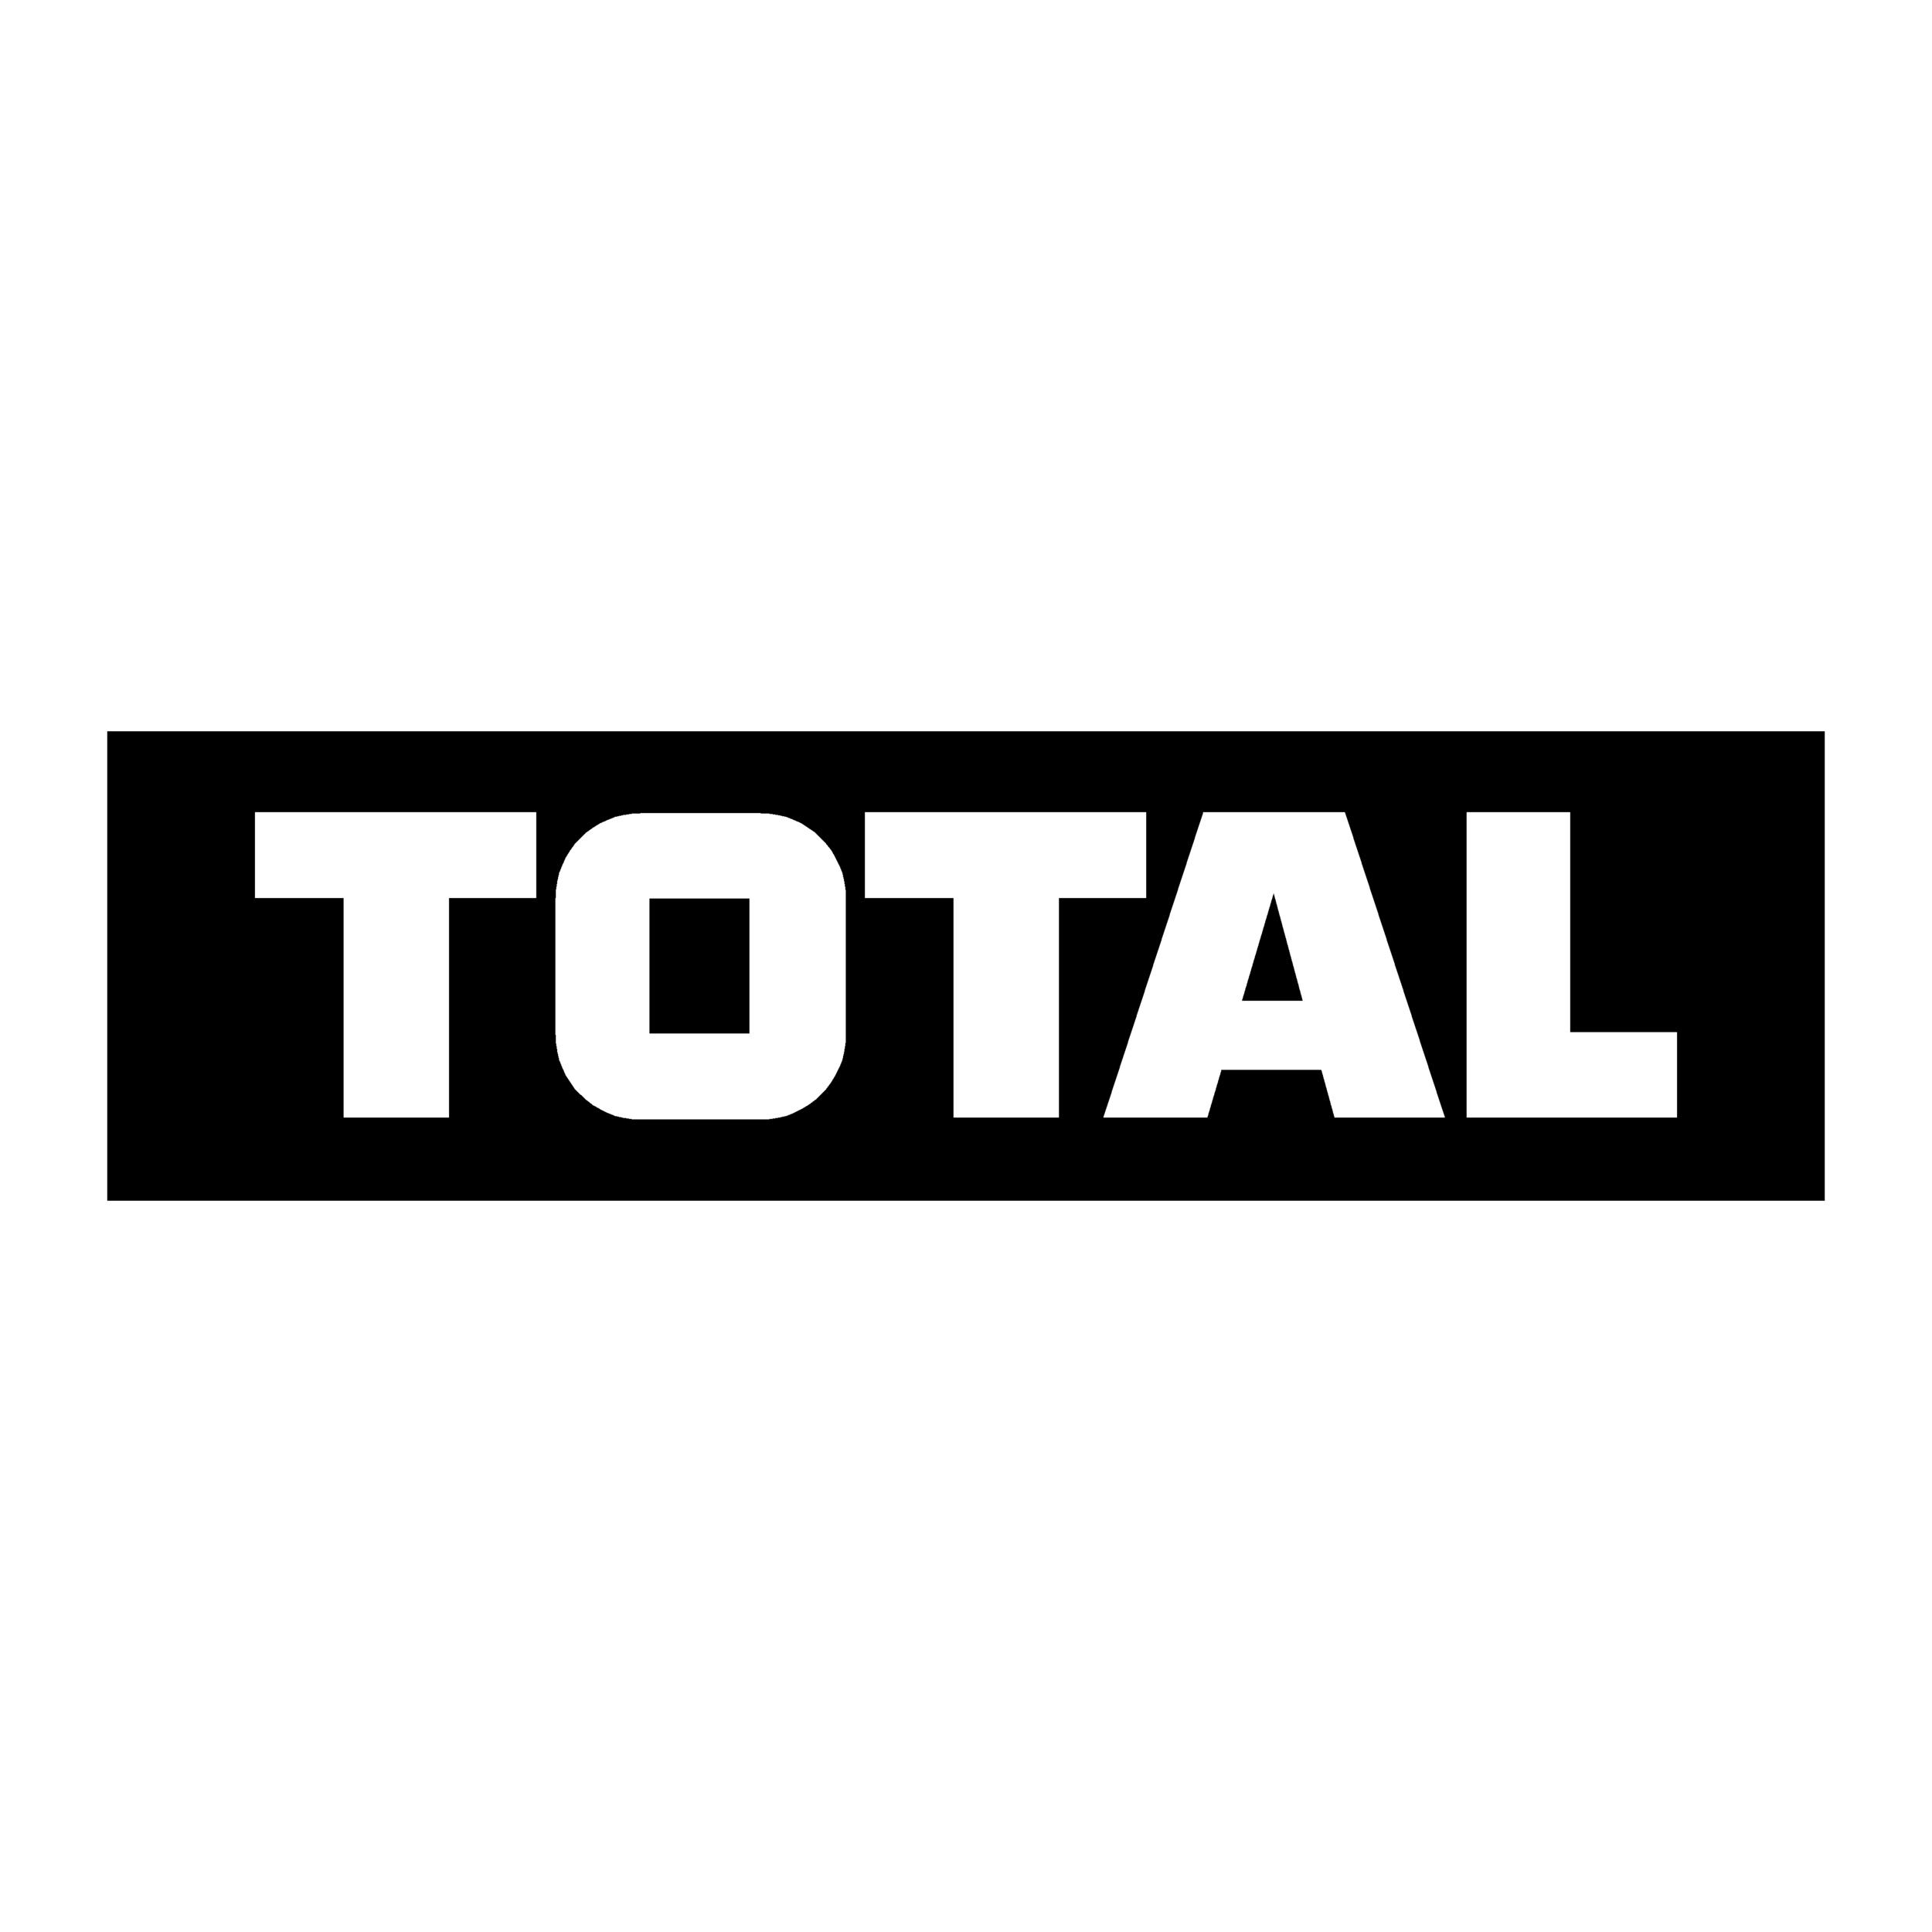 stickers-total-ref-1-tuning-audio-sonorisation-car-auto-moto-camion-competition-deco-rallye-autocollant-min